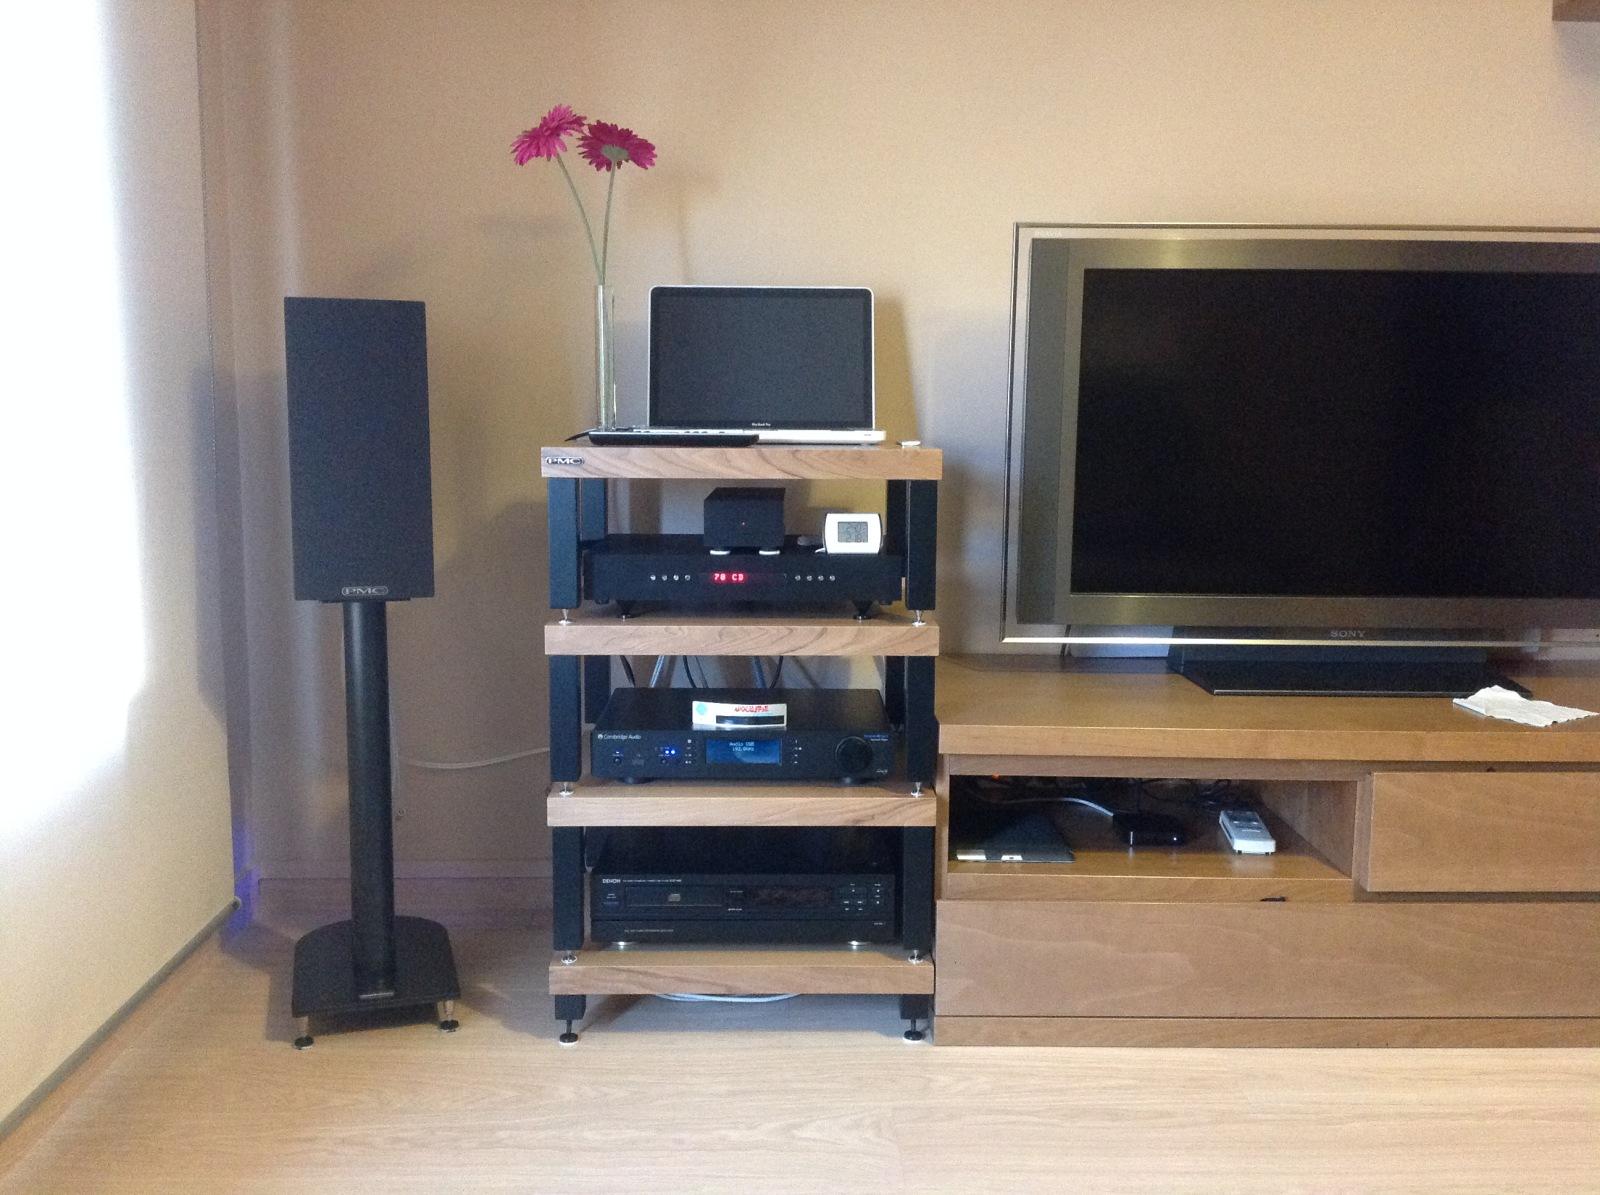 Nuevo mueble HIFI HUM 103hdvd